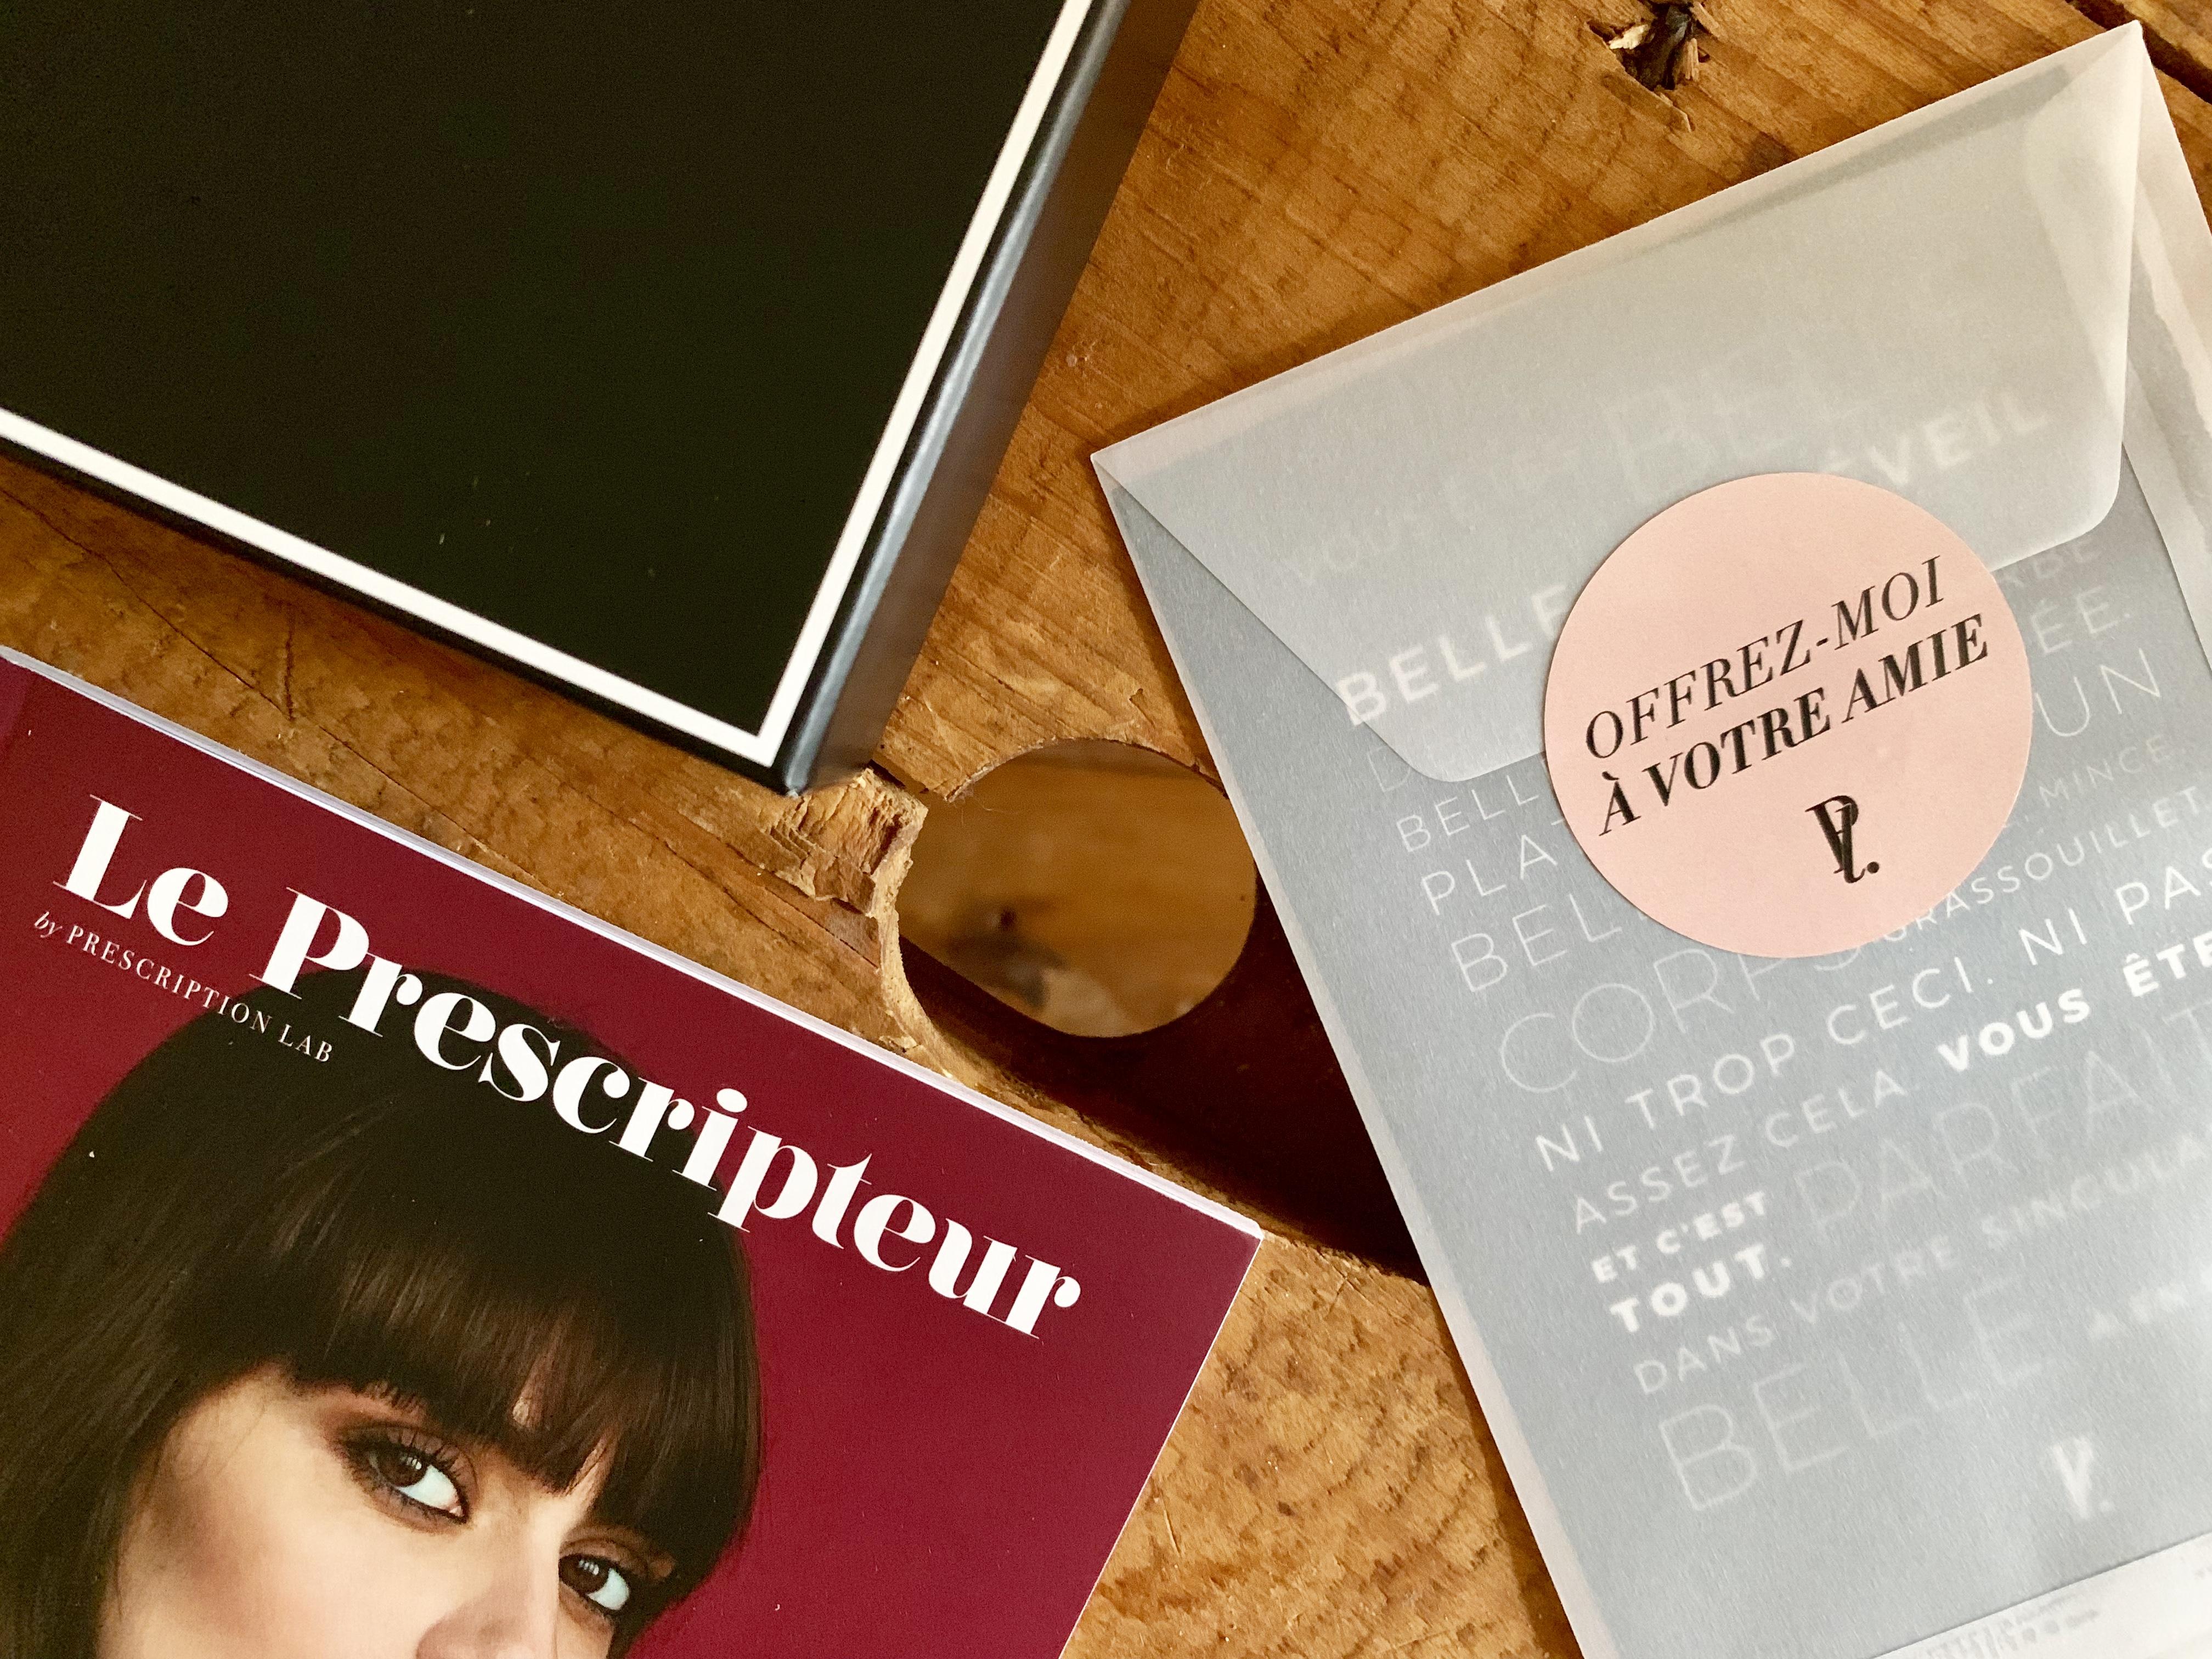 contenu prescriptionlab fevrier 2019